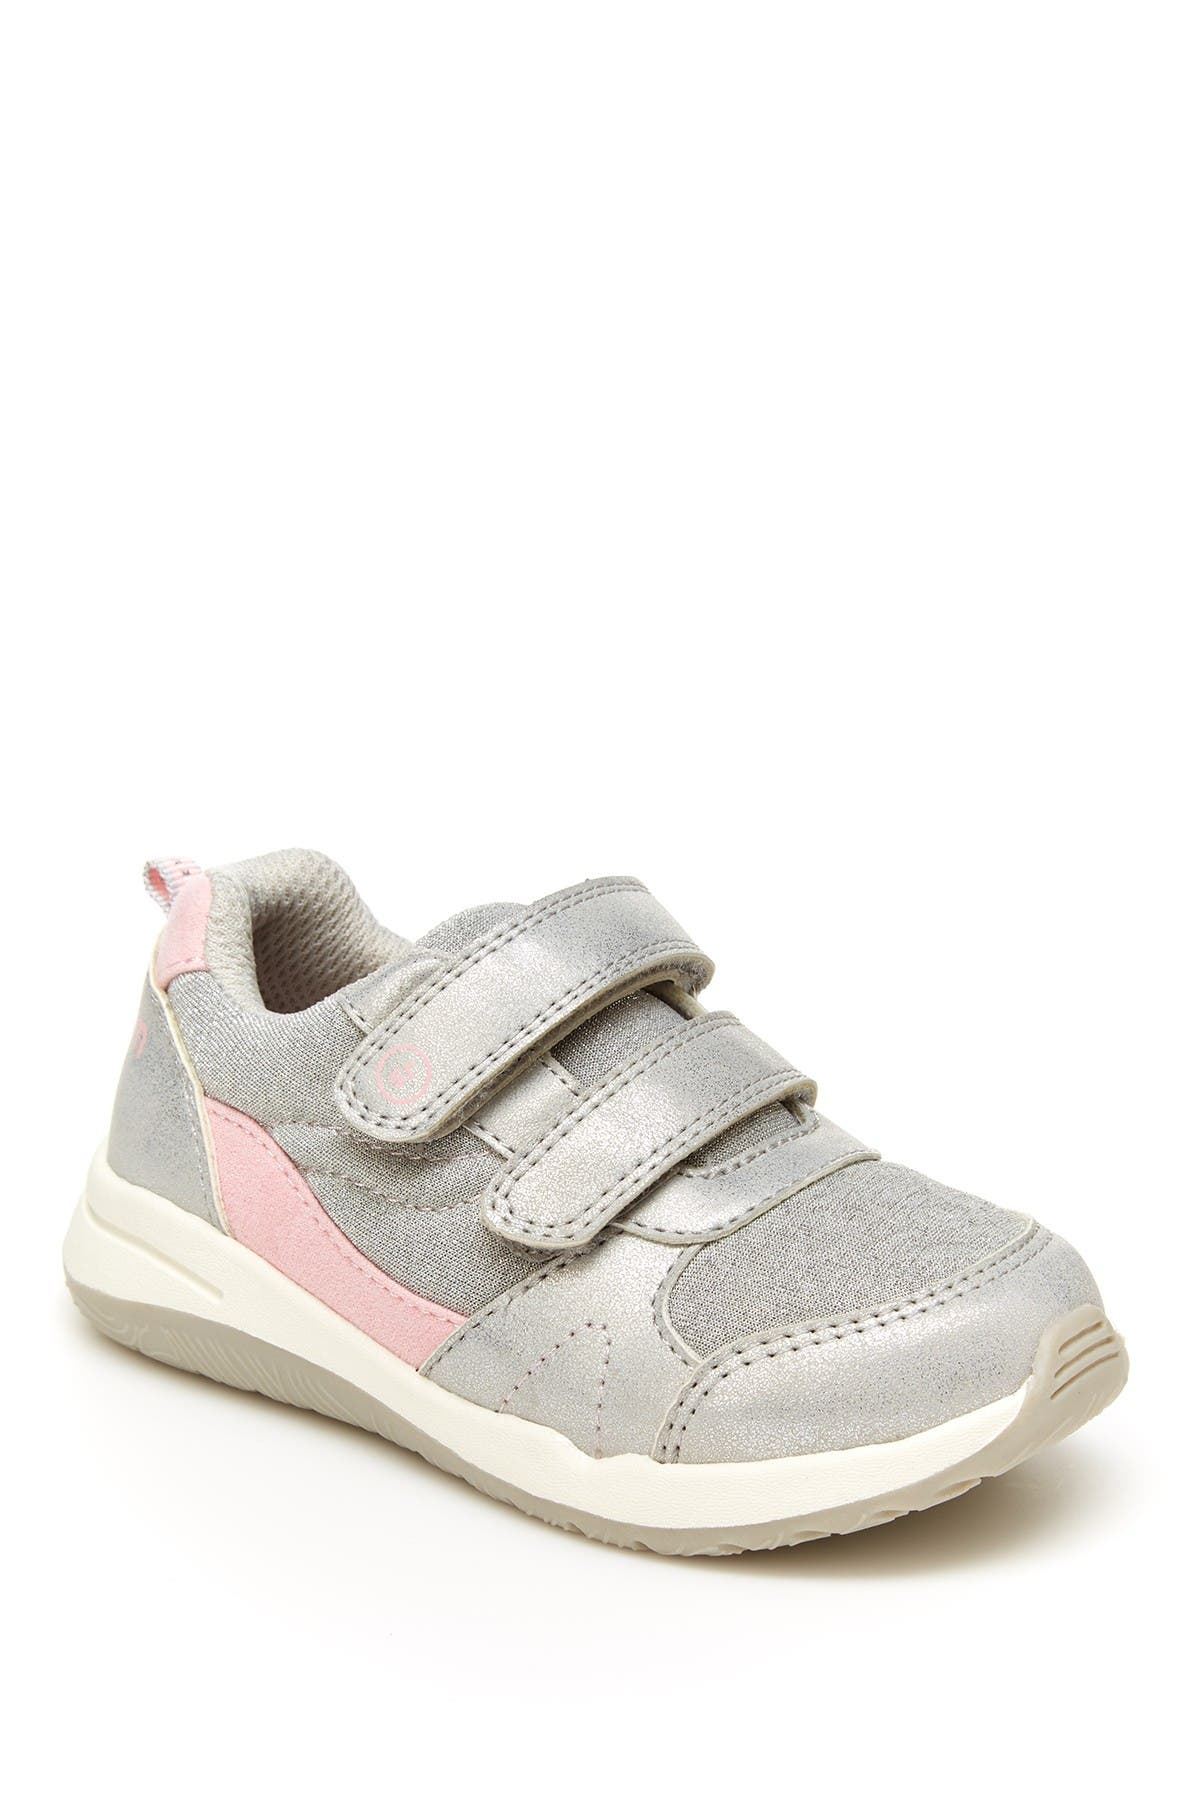 Stride Rite Kids' Girls' Shoes